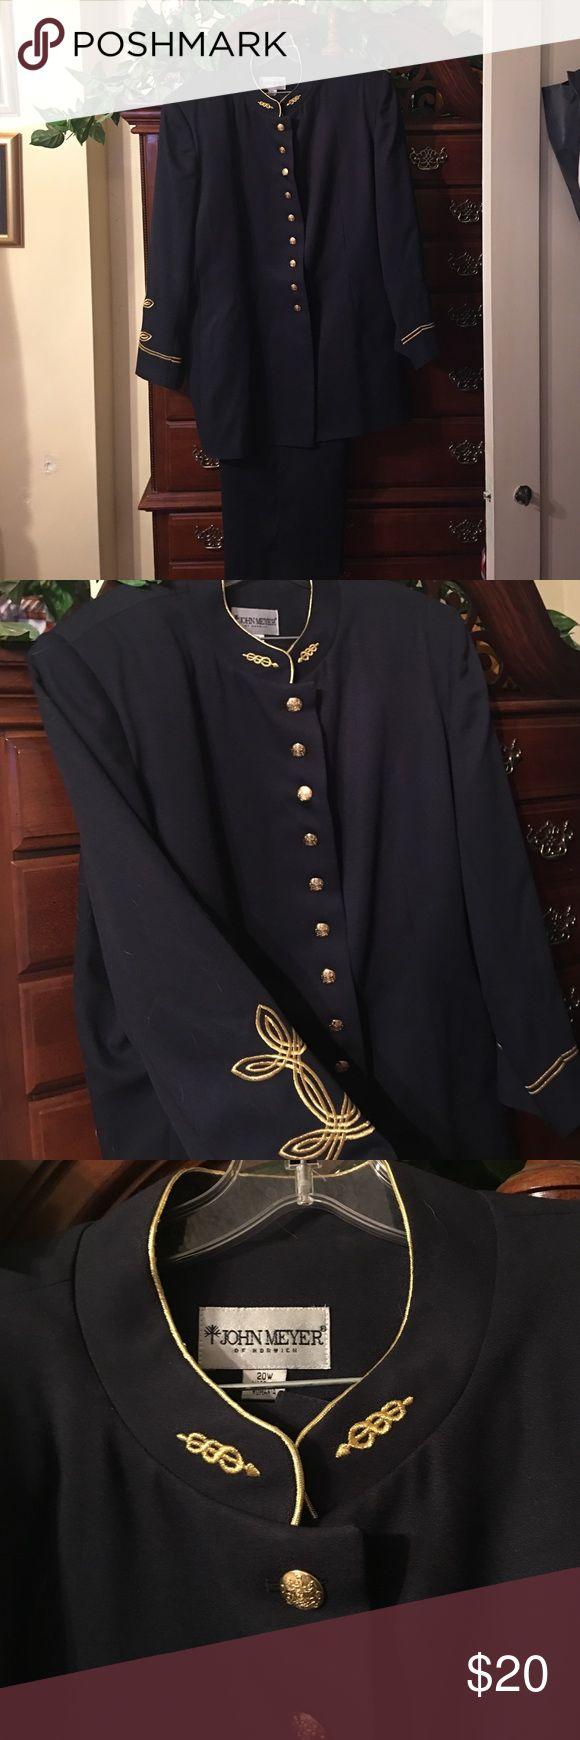 Black Plus Size Pant Suit Plus Size Pant Suit with gold trimming & gold buttons John Meyer of Norwich Pants Trousers